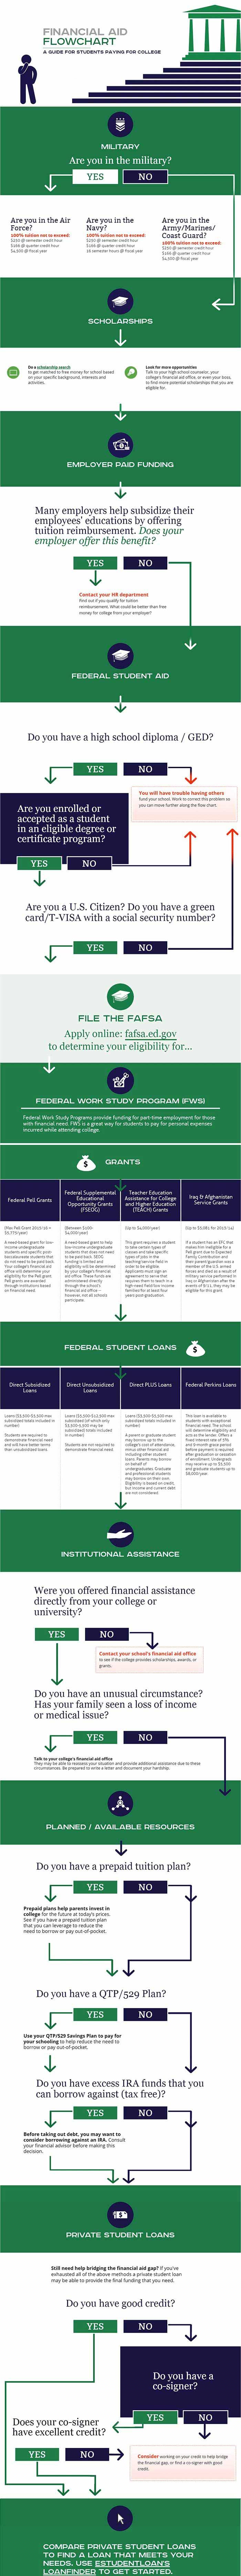 financial aid flowchart